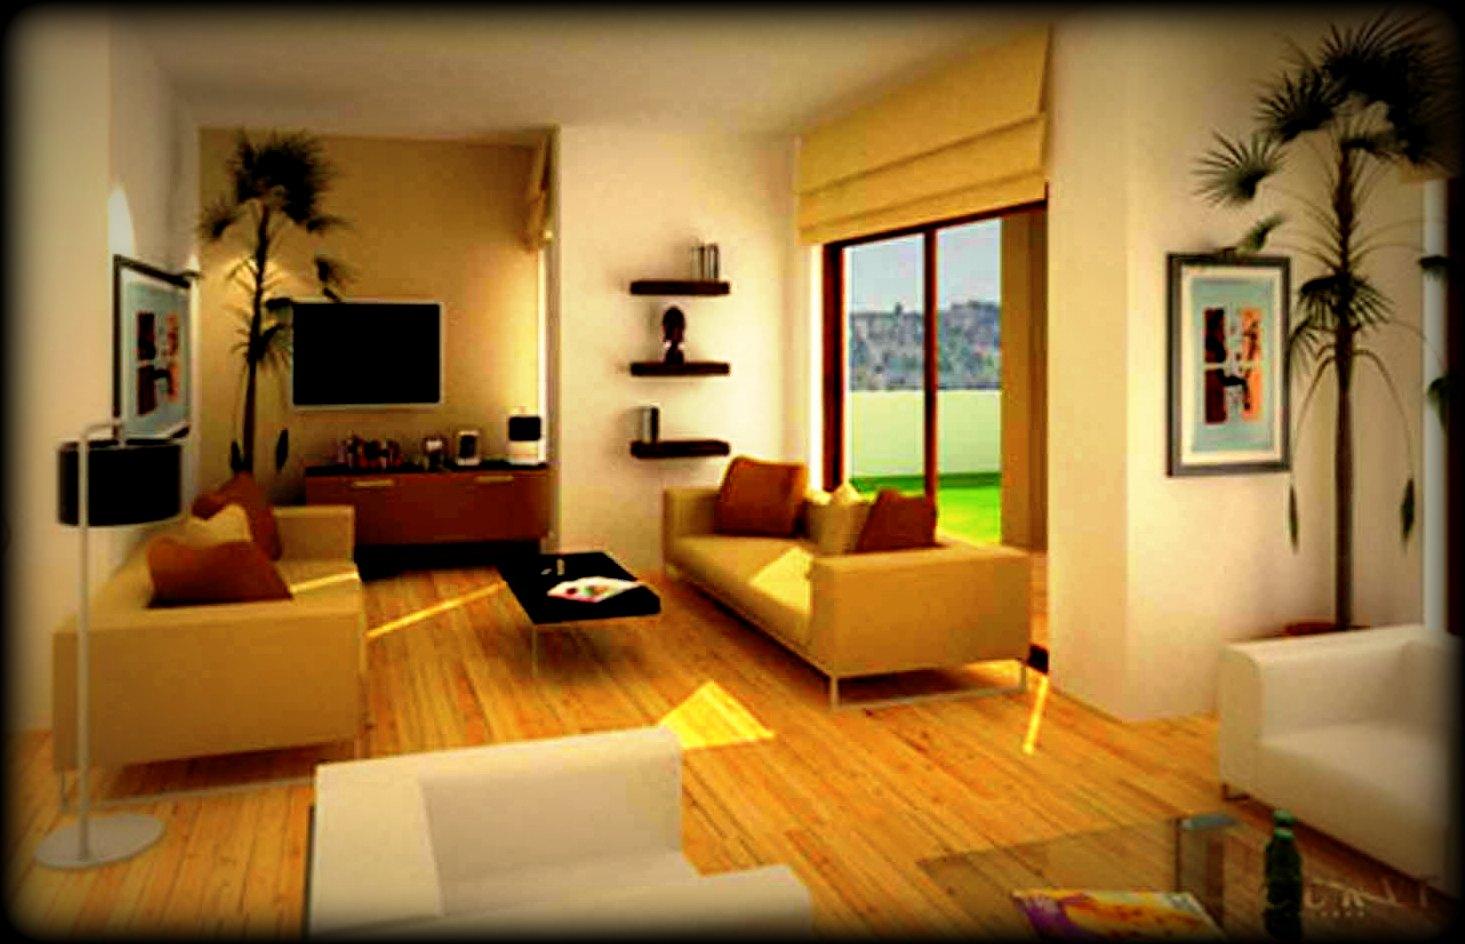 Classy Rental Apartment Decor Ideas